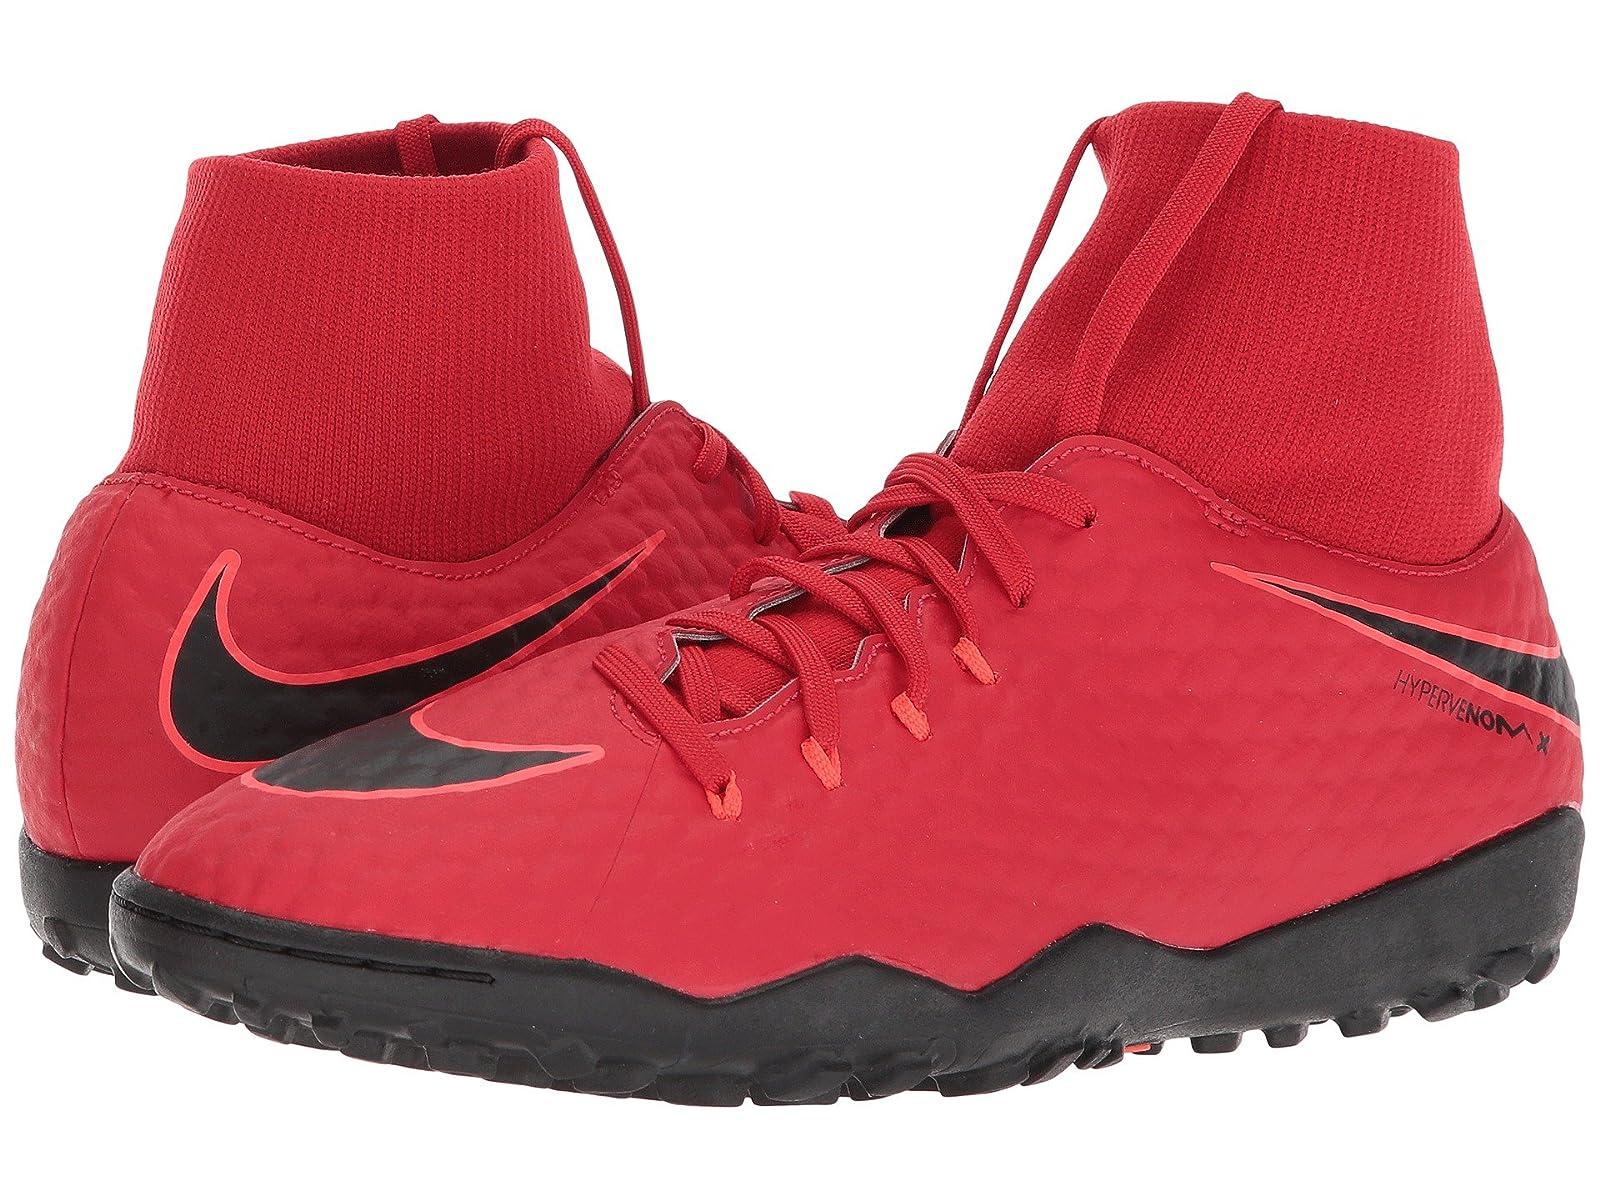 Nike HypervenomX Phelon III Dynamic Fit TFCheap and distinctive eye-catching shoes